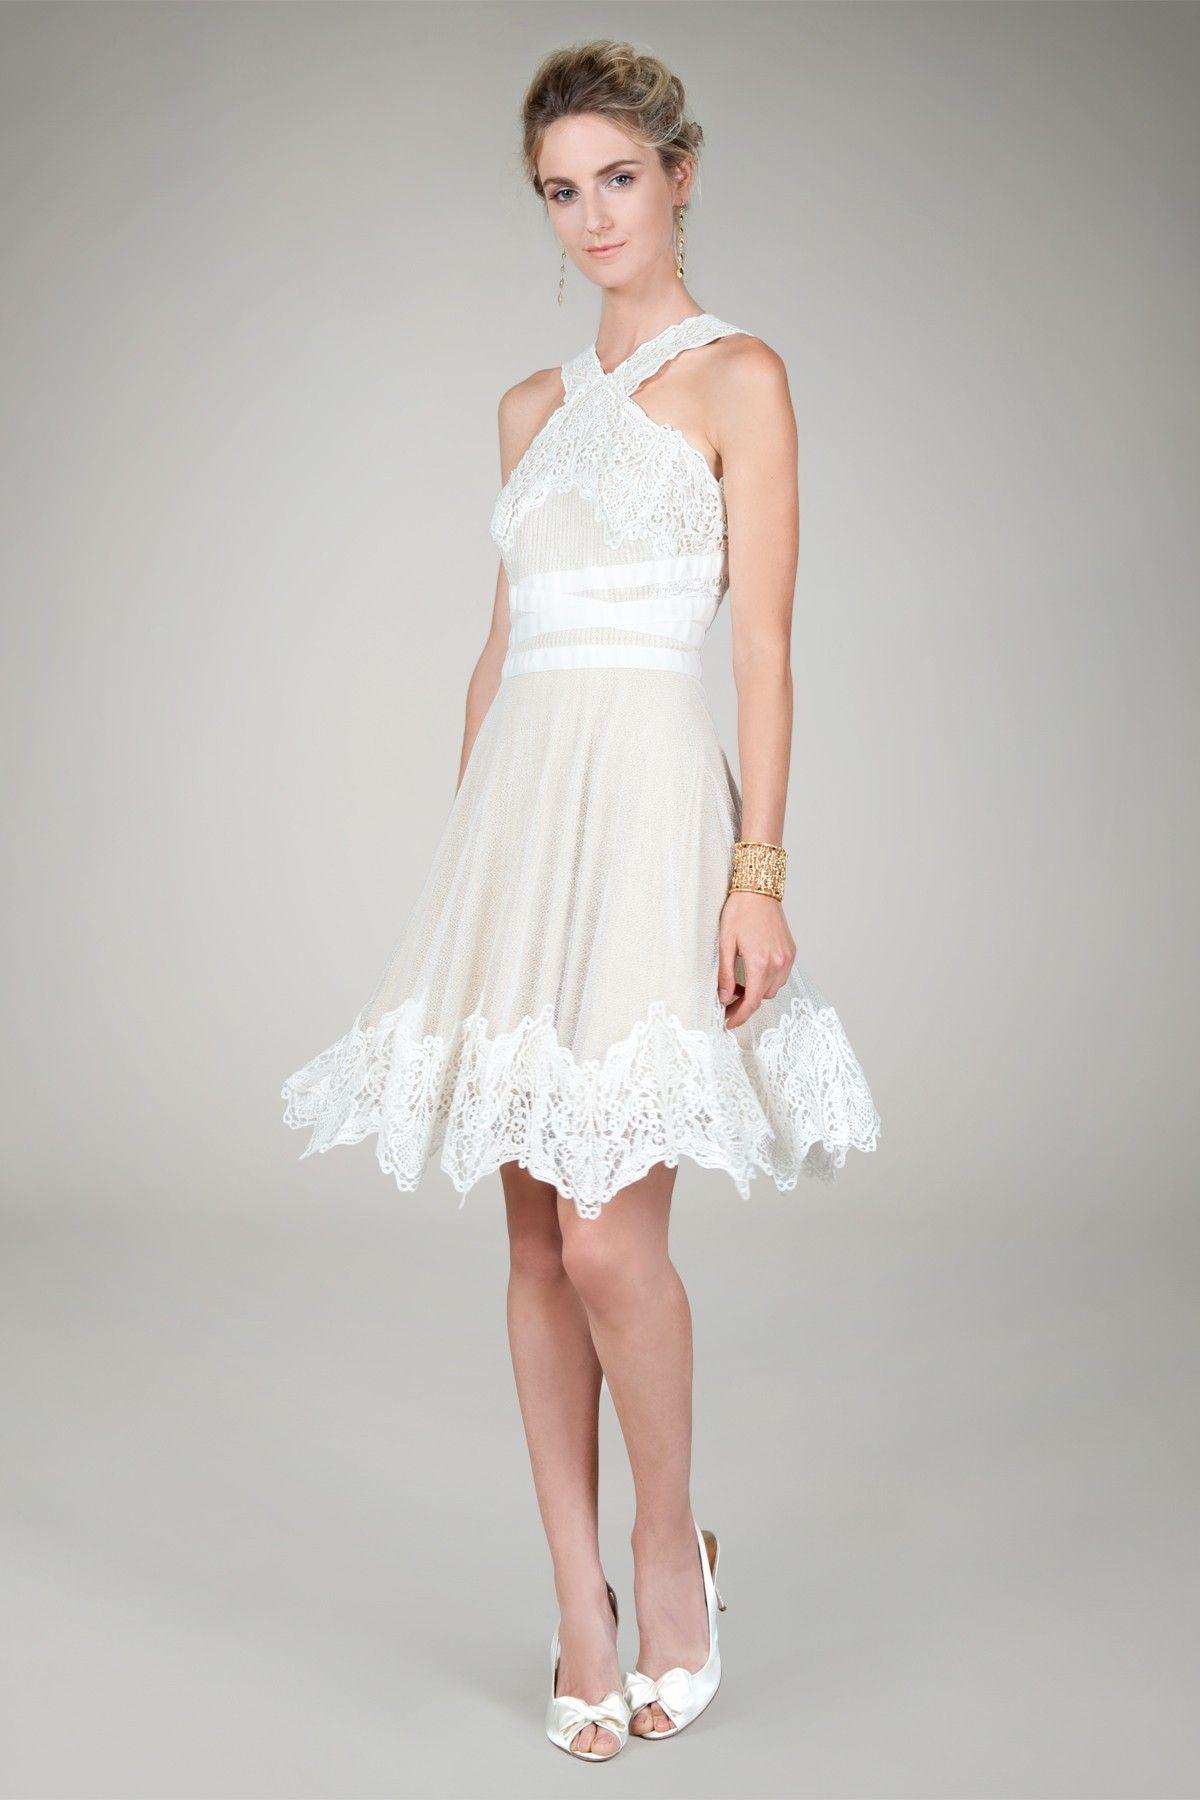 Wedding reception dresses for bride  Tadashi Shoji  Adrienneus Wedding  Pinterest  Bridal suite